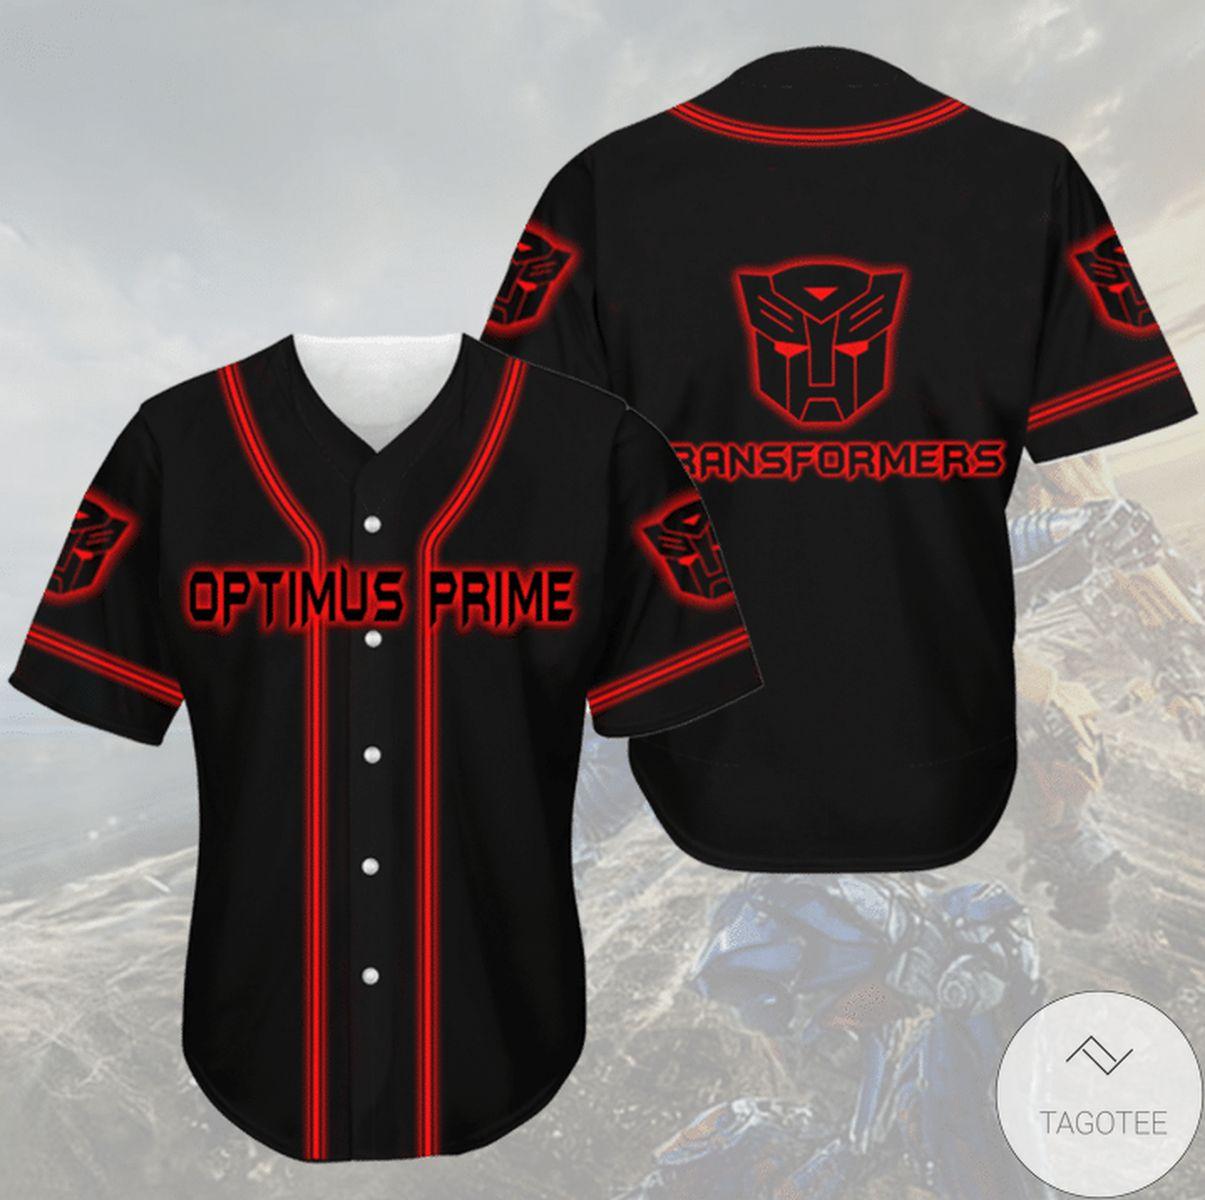 Us Store Optimus Prime Transformer Jersey Baseball Shirt